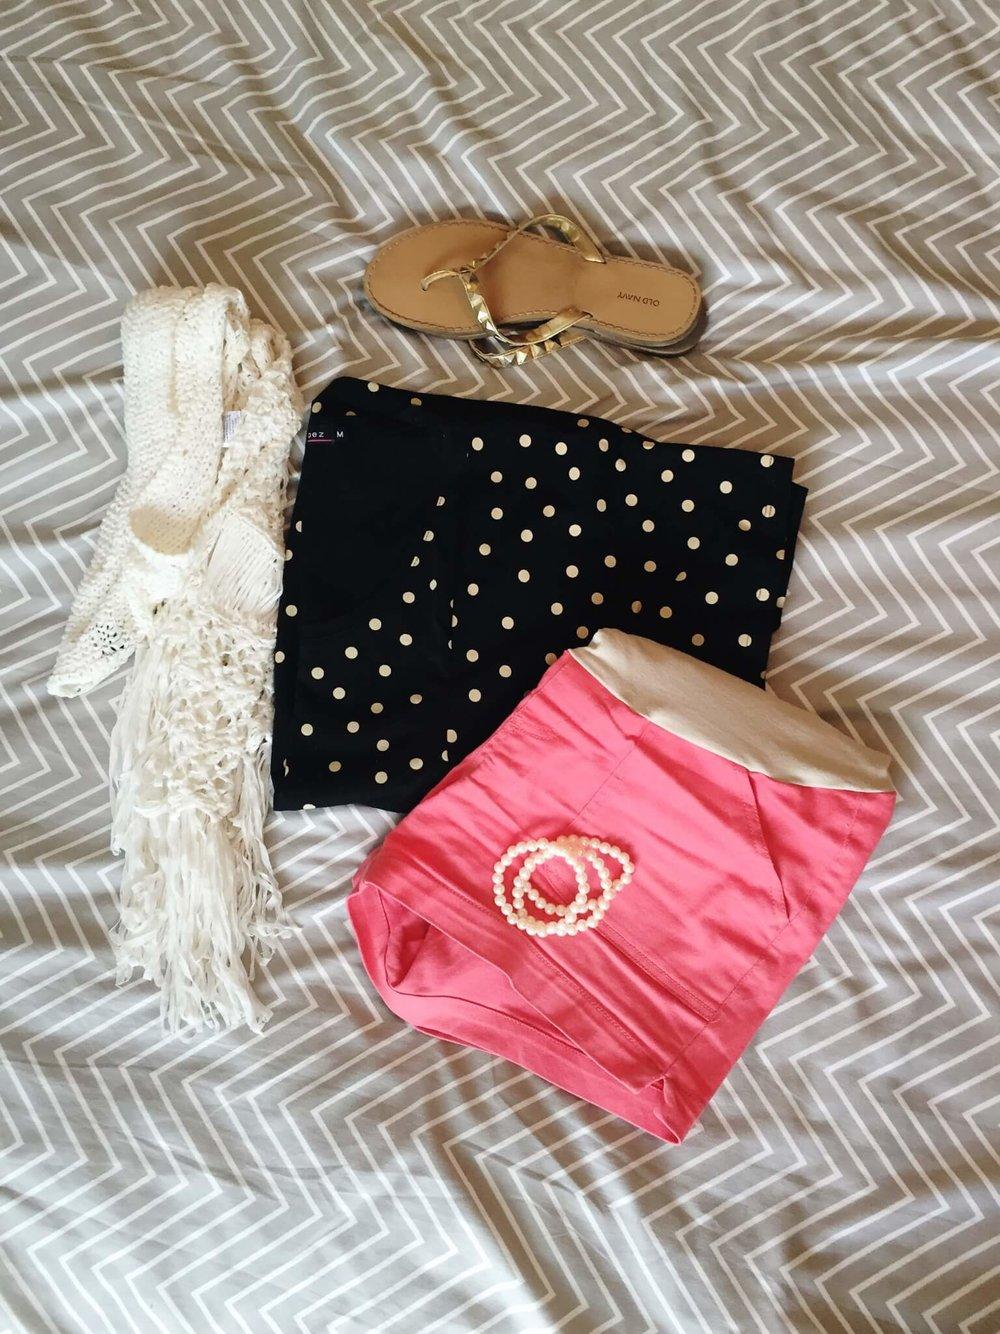 Tee + Crochet Vest + Shorts + Sandals